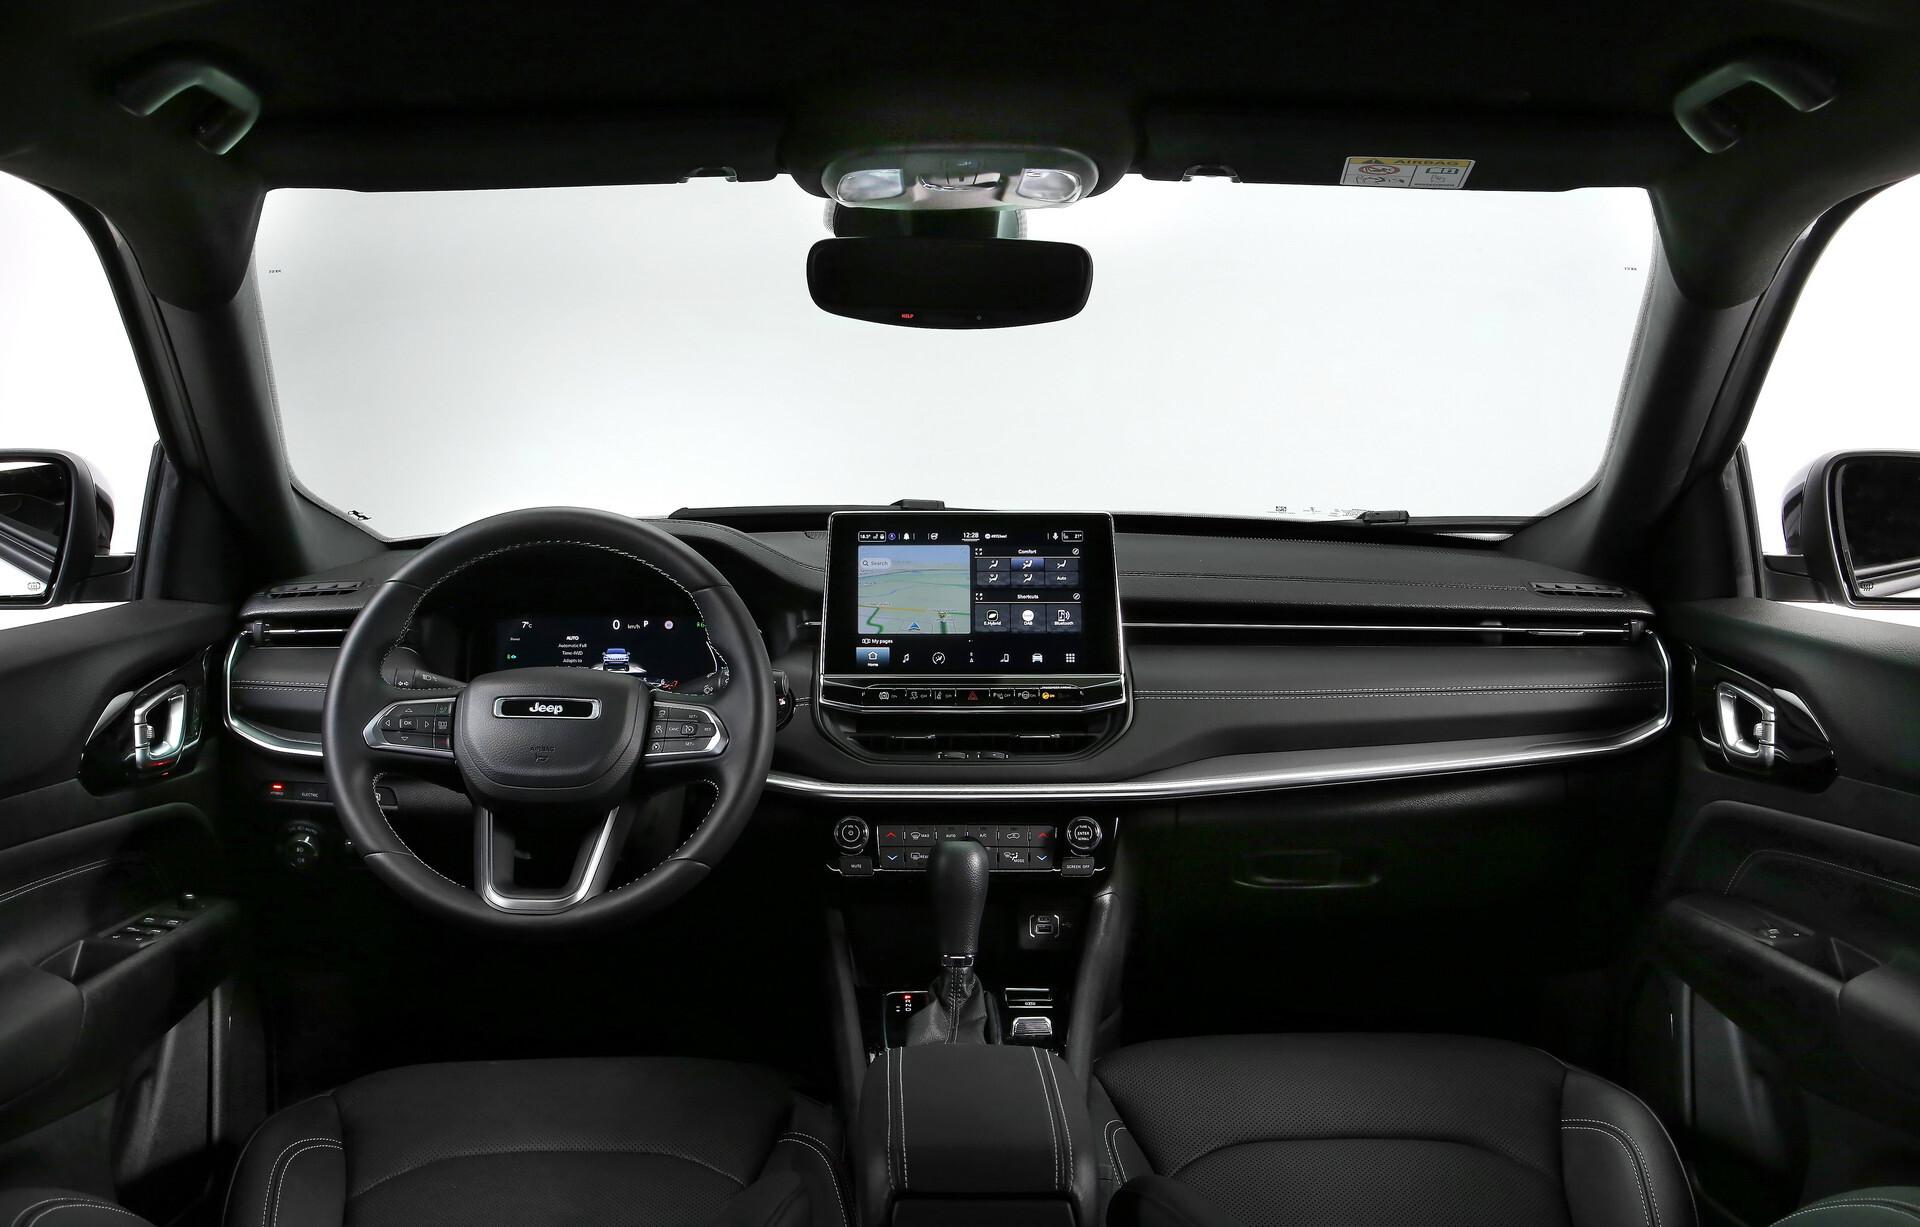 2021 Jeep Compass Europe 51 Jpg